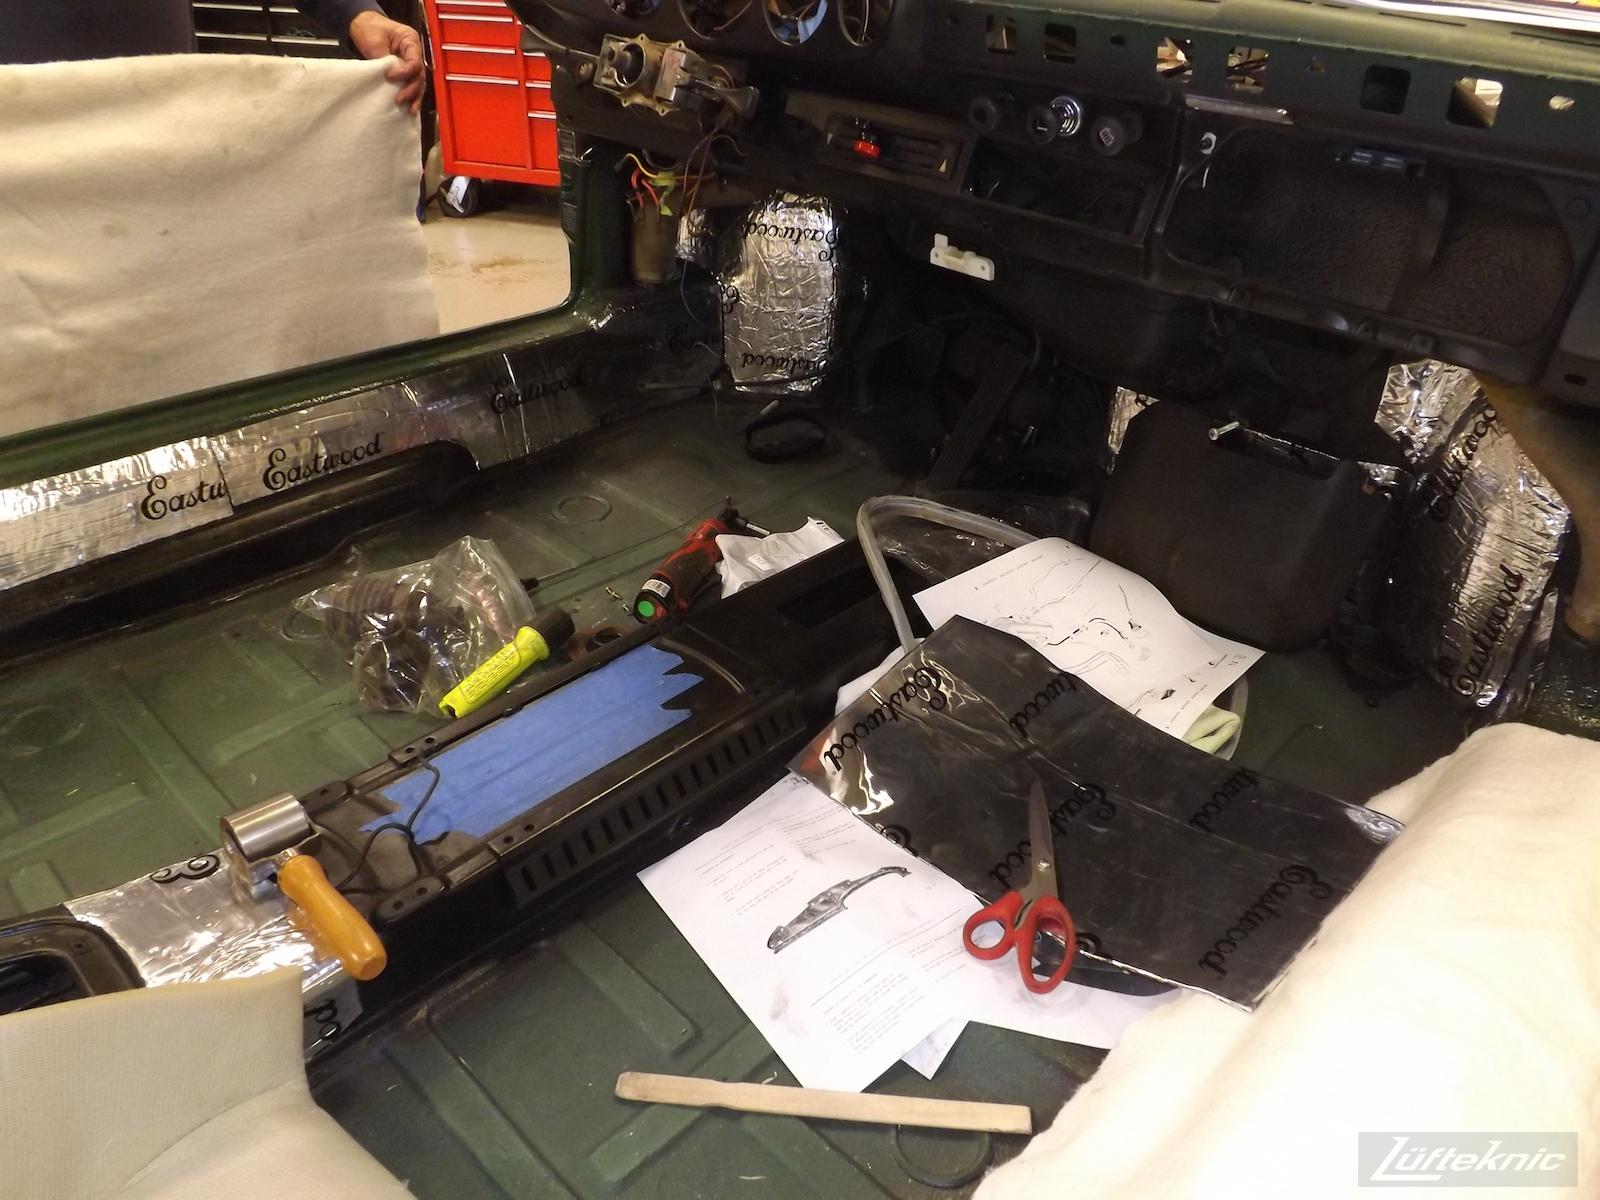 Installing Eastwood sound deadening panels on an Irish Green Porsche 912 undergoing restoration at Lufteknic.